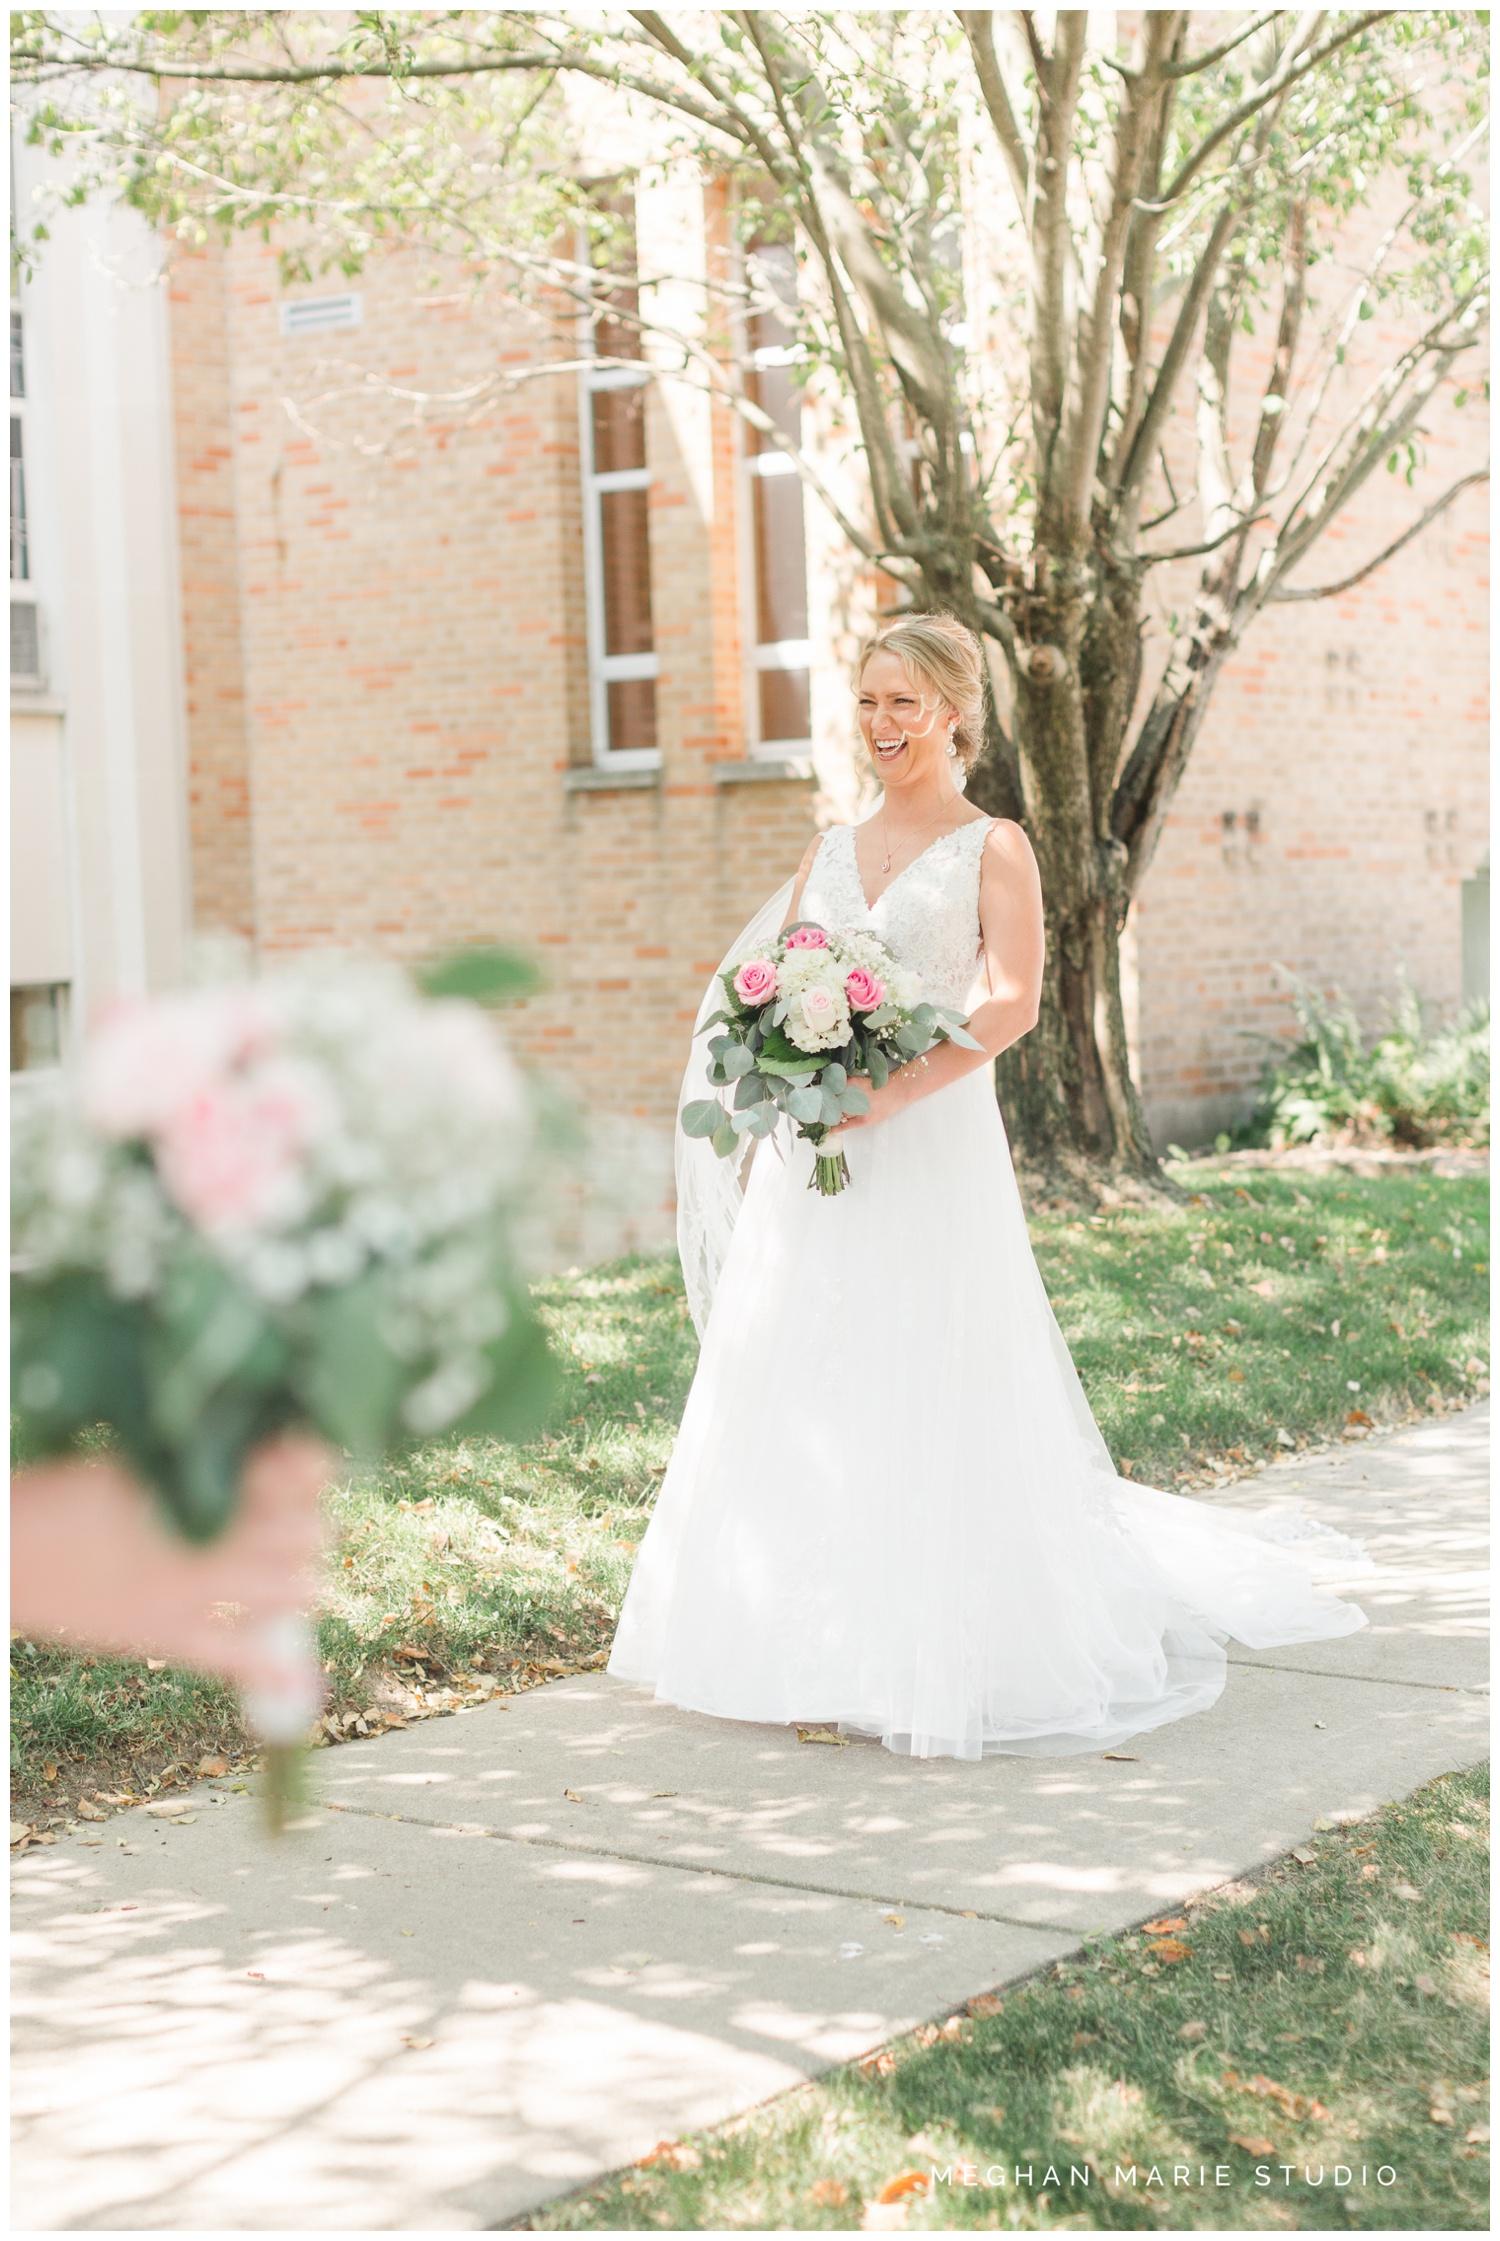 meghan marie studio ohio wedding kyle ahrens msu michigan state basketball spartans navy blush rustic barn soft warm bright bubbles catholic church_0353.jpg